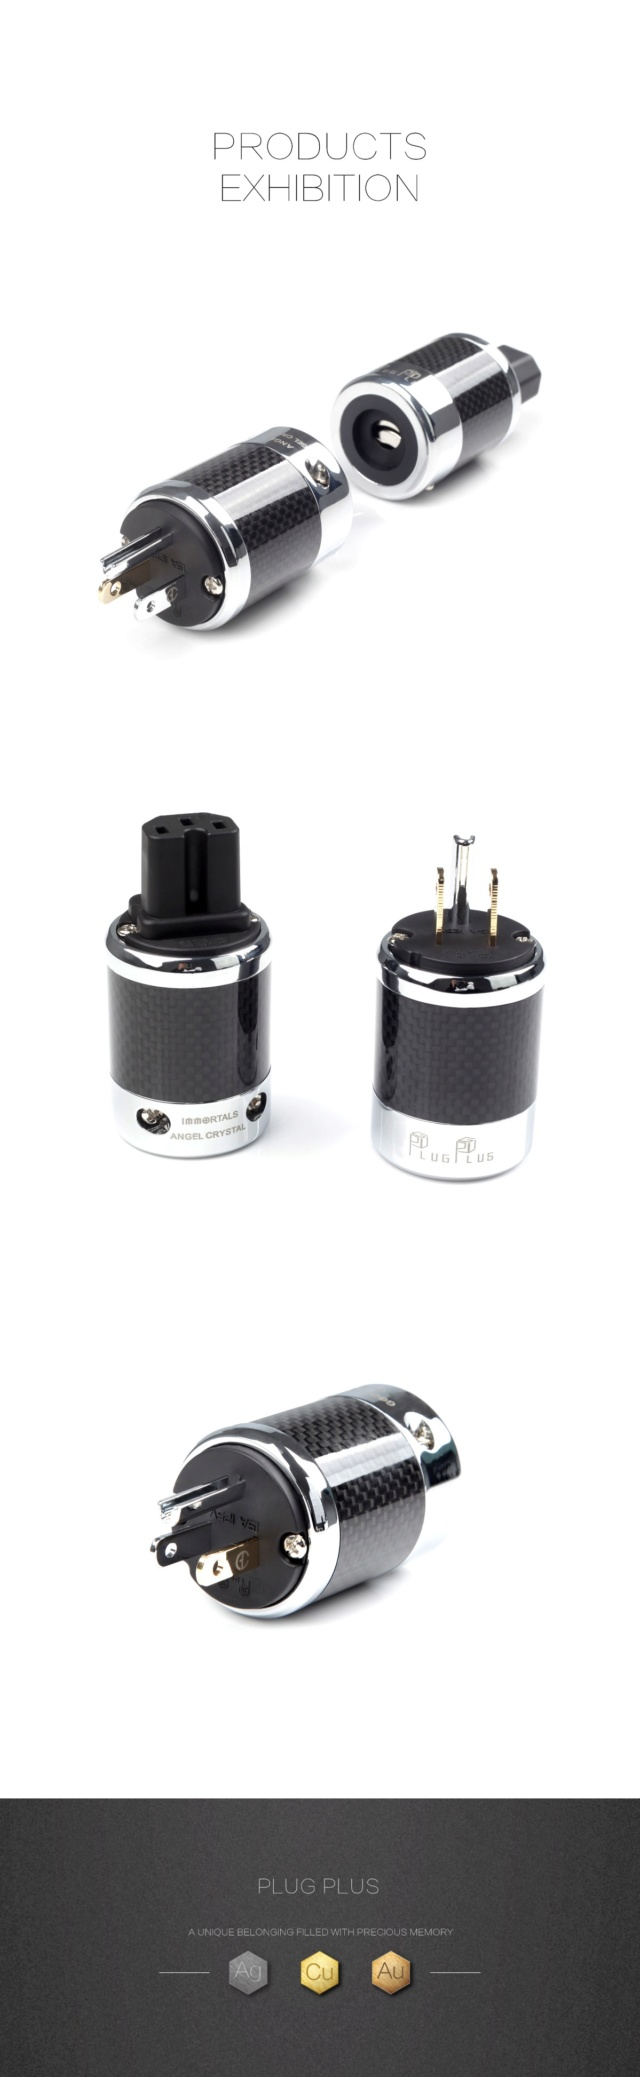 Plugplus US Standard Power Plug & IEM Plug Fantasy Series - Immortal Immort20